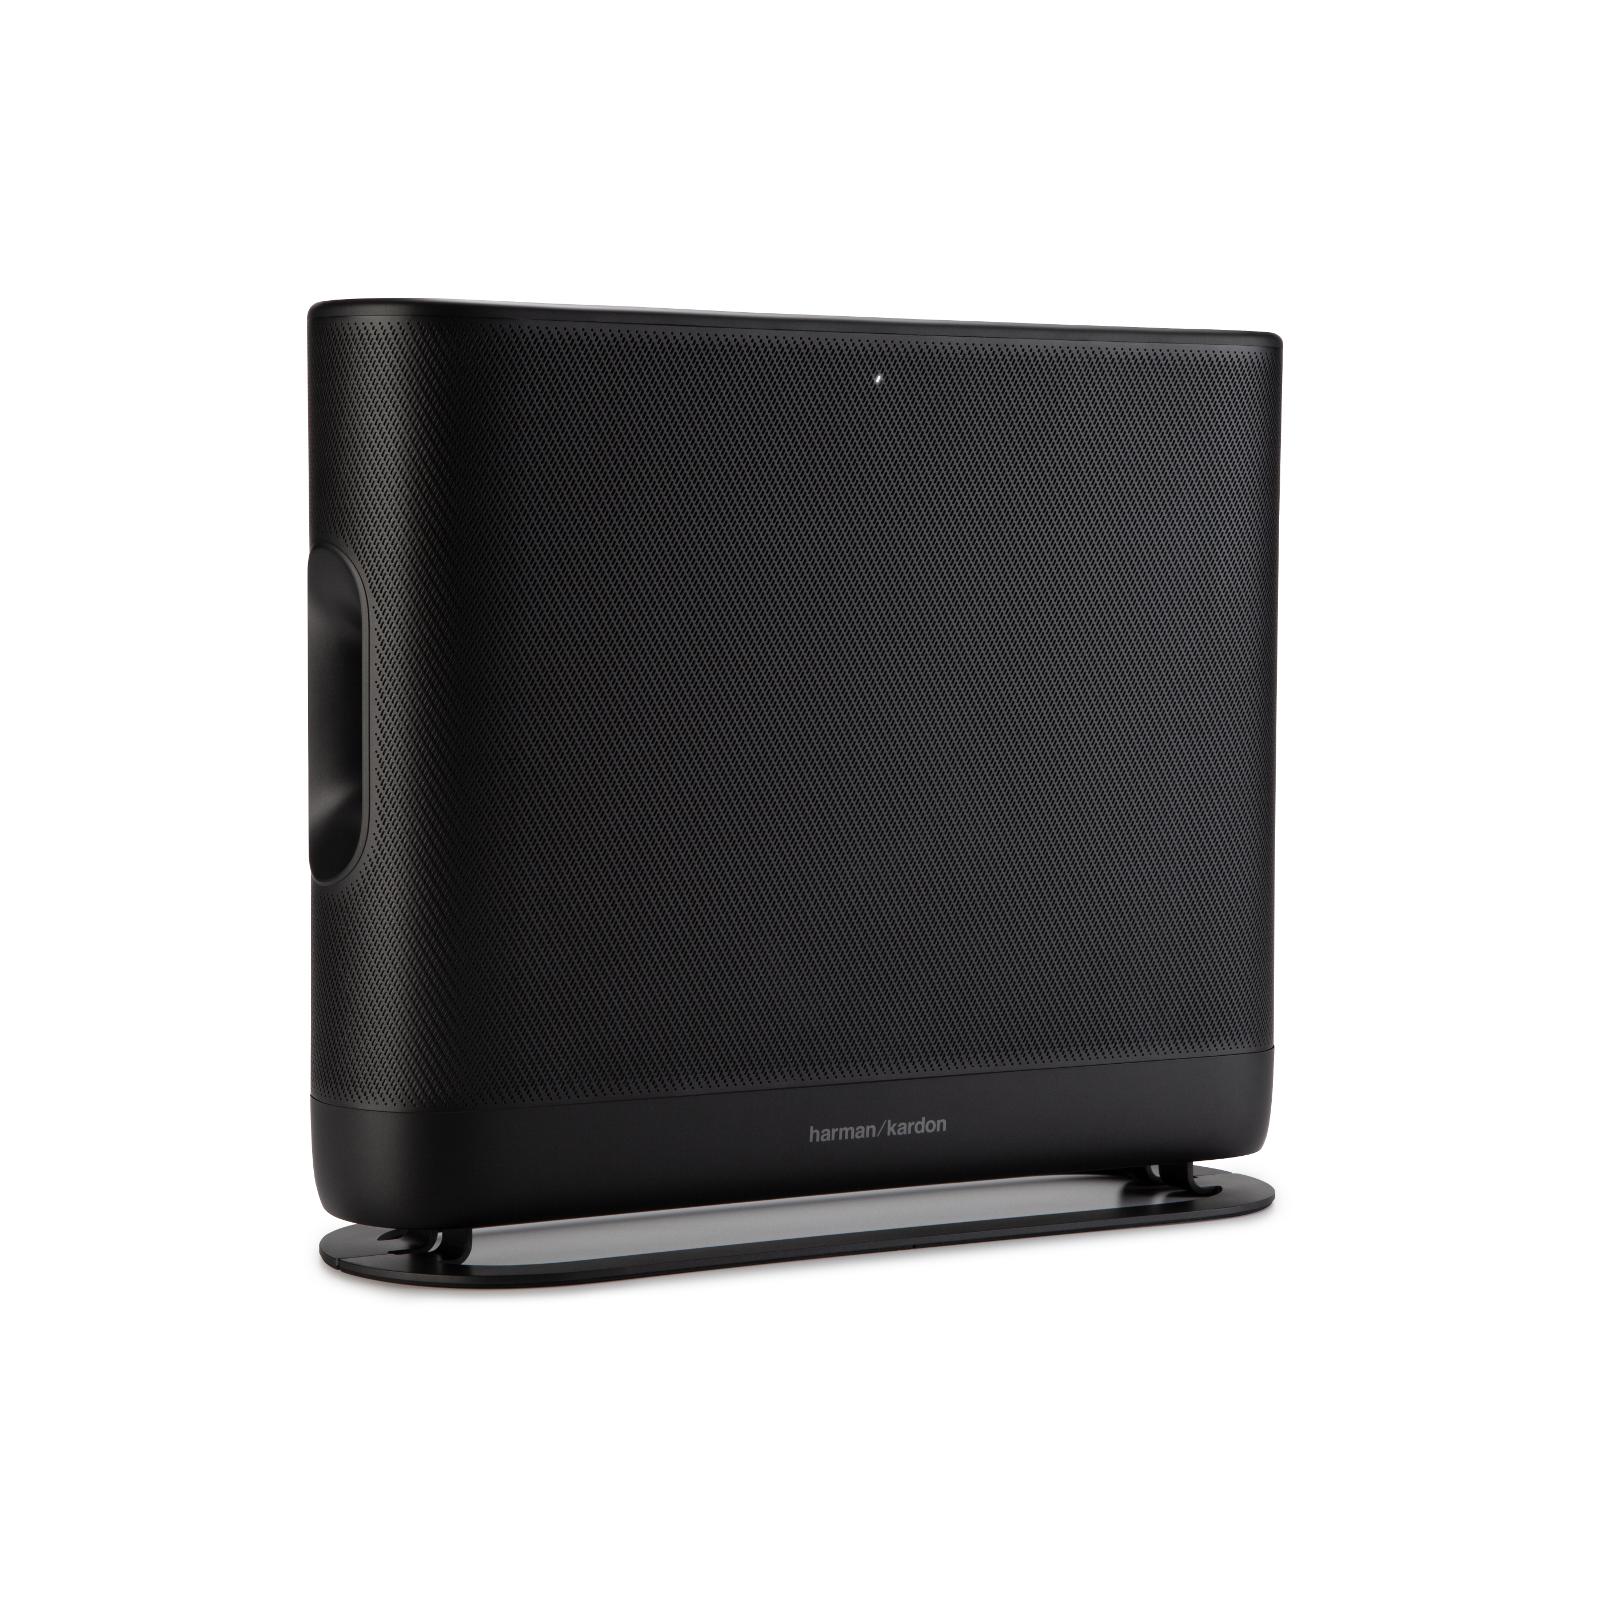 Harman Kardon Surround - Black - Wireless Home Theater System - Detailshot 5